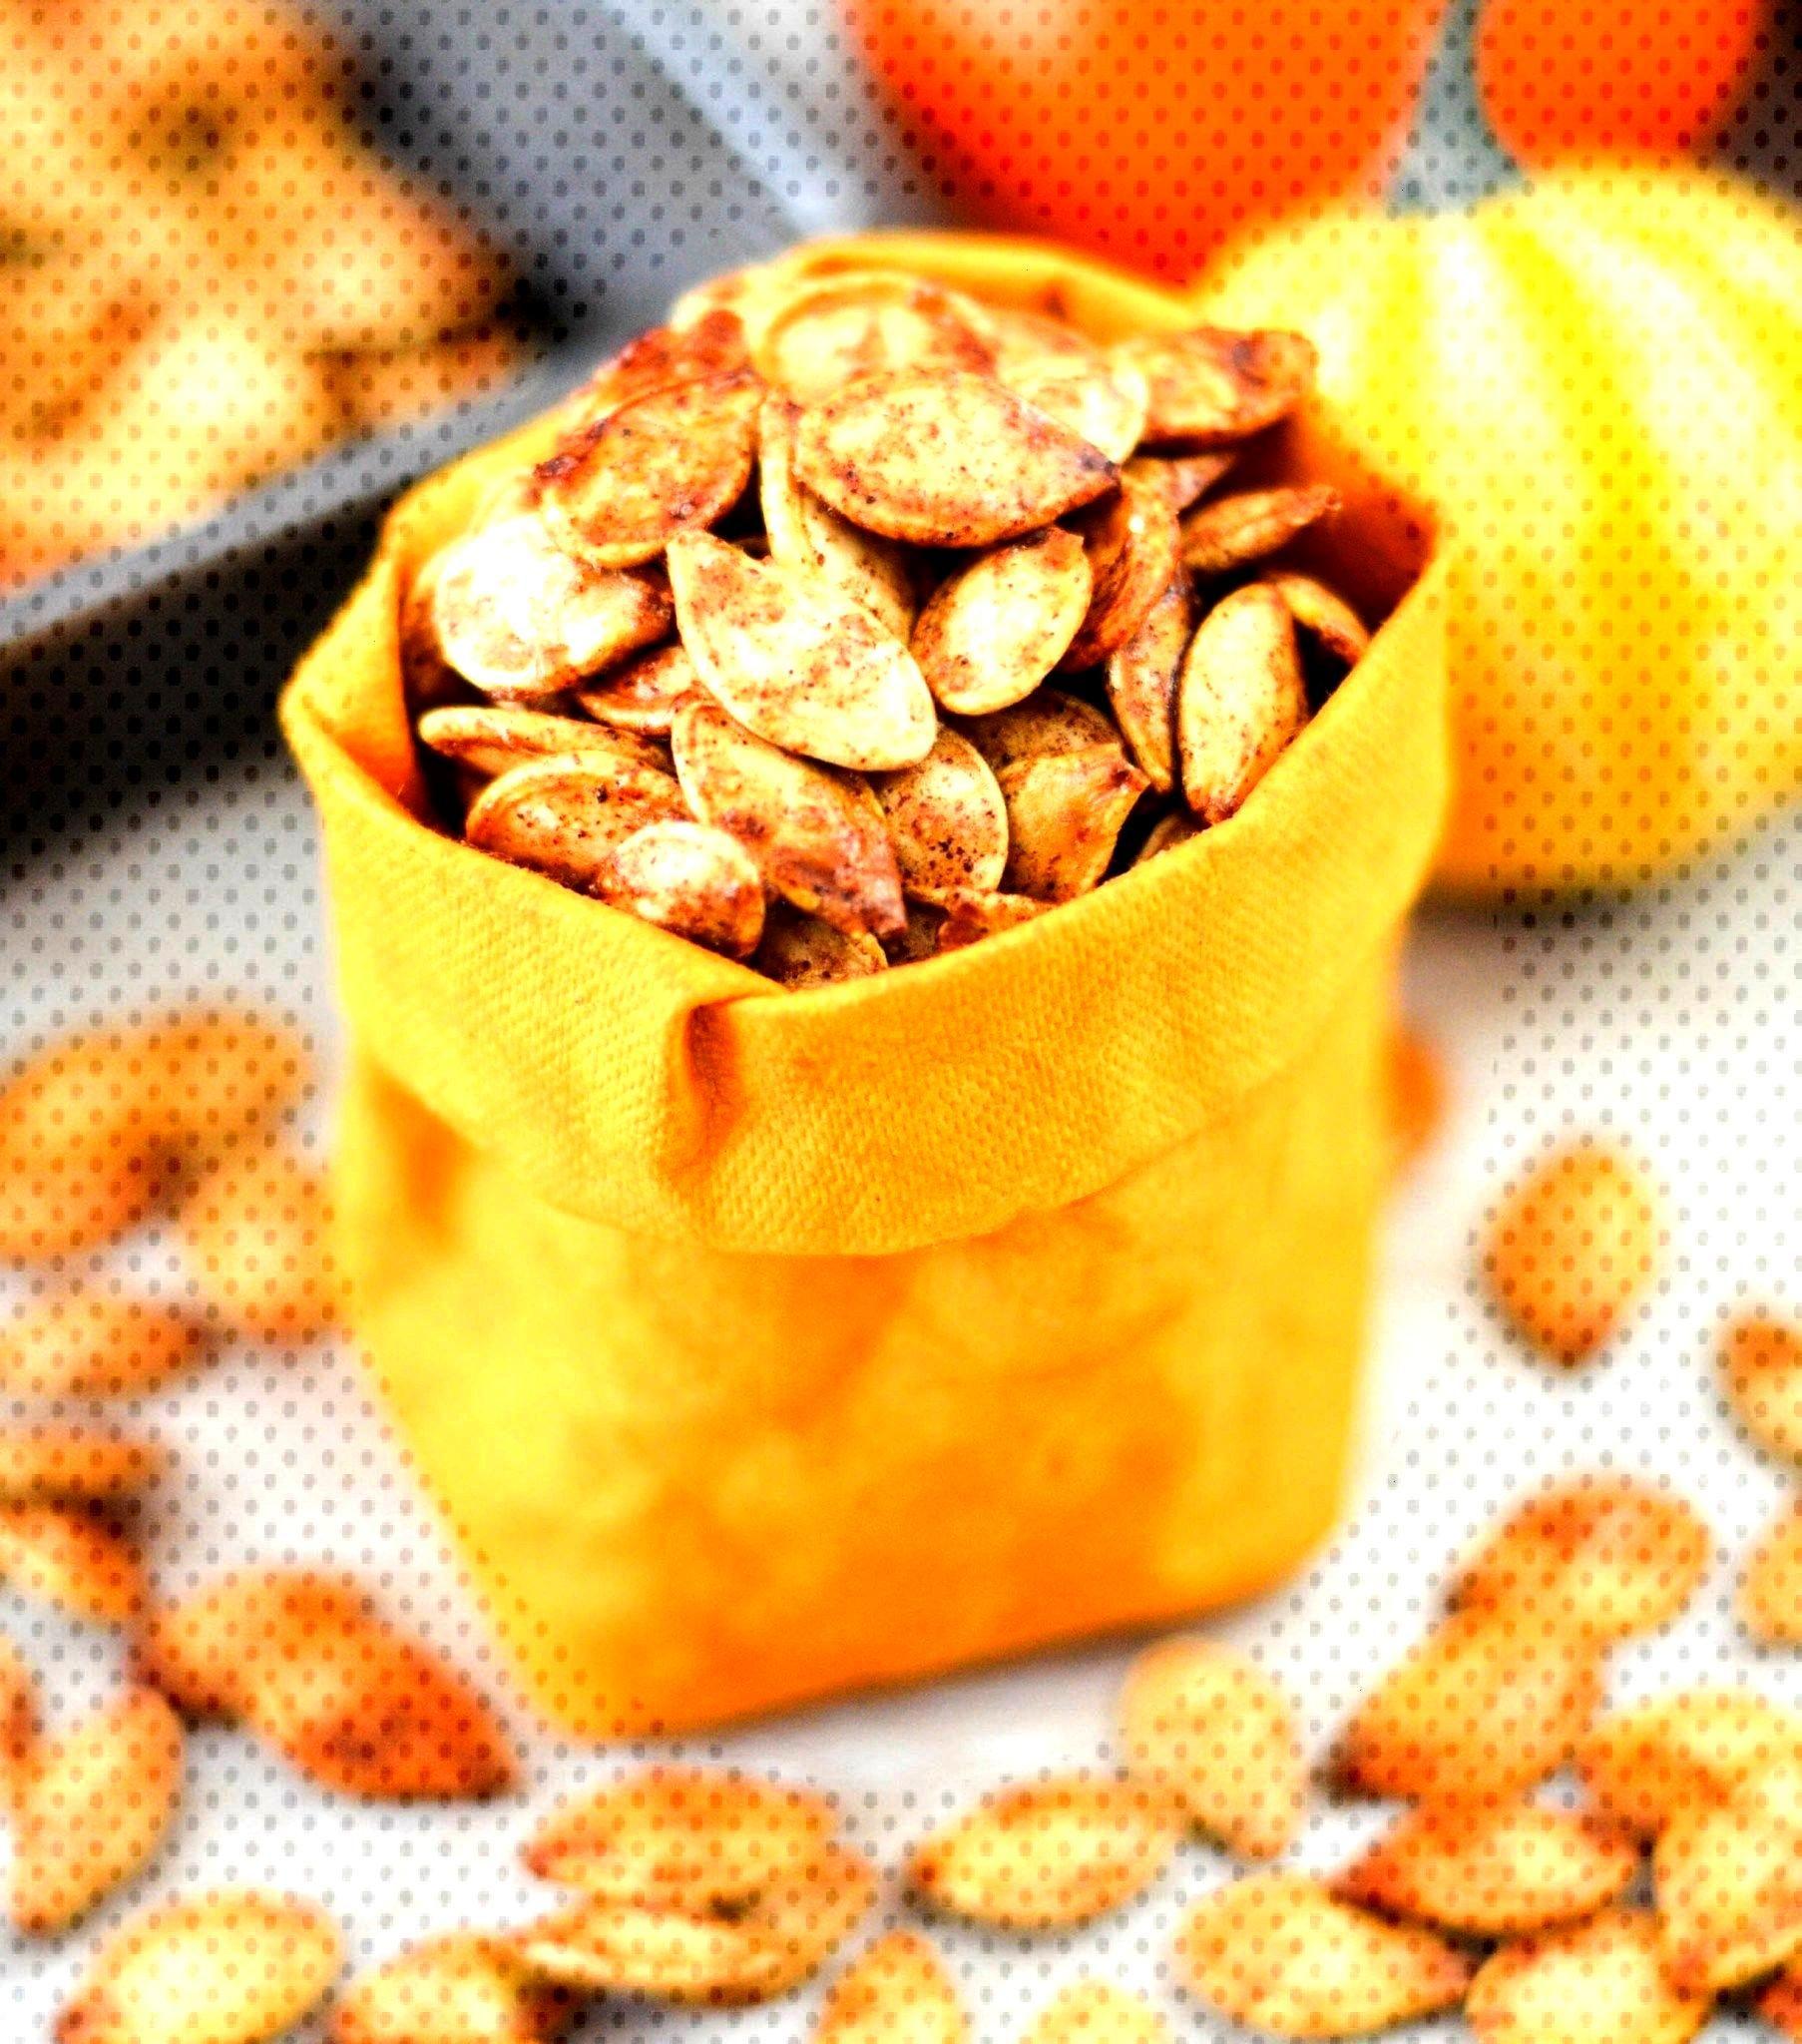 Cinnamon Sugar Pumpkin Seeds! A recipe for the perfect sweet and salty ... , Homemade Cinnamon Sug